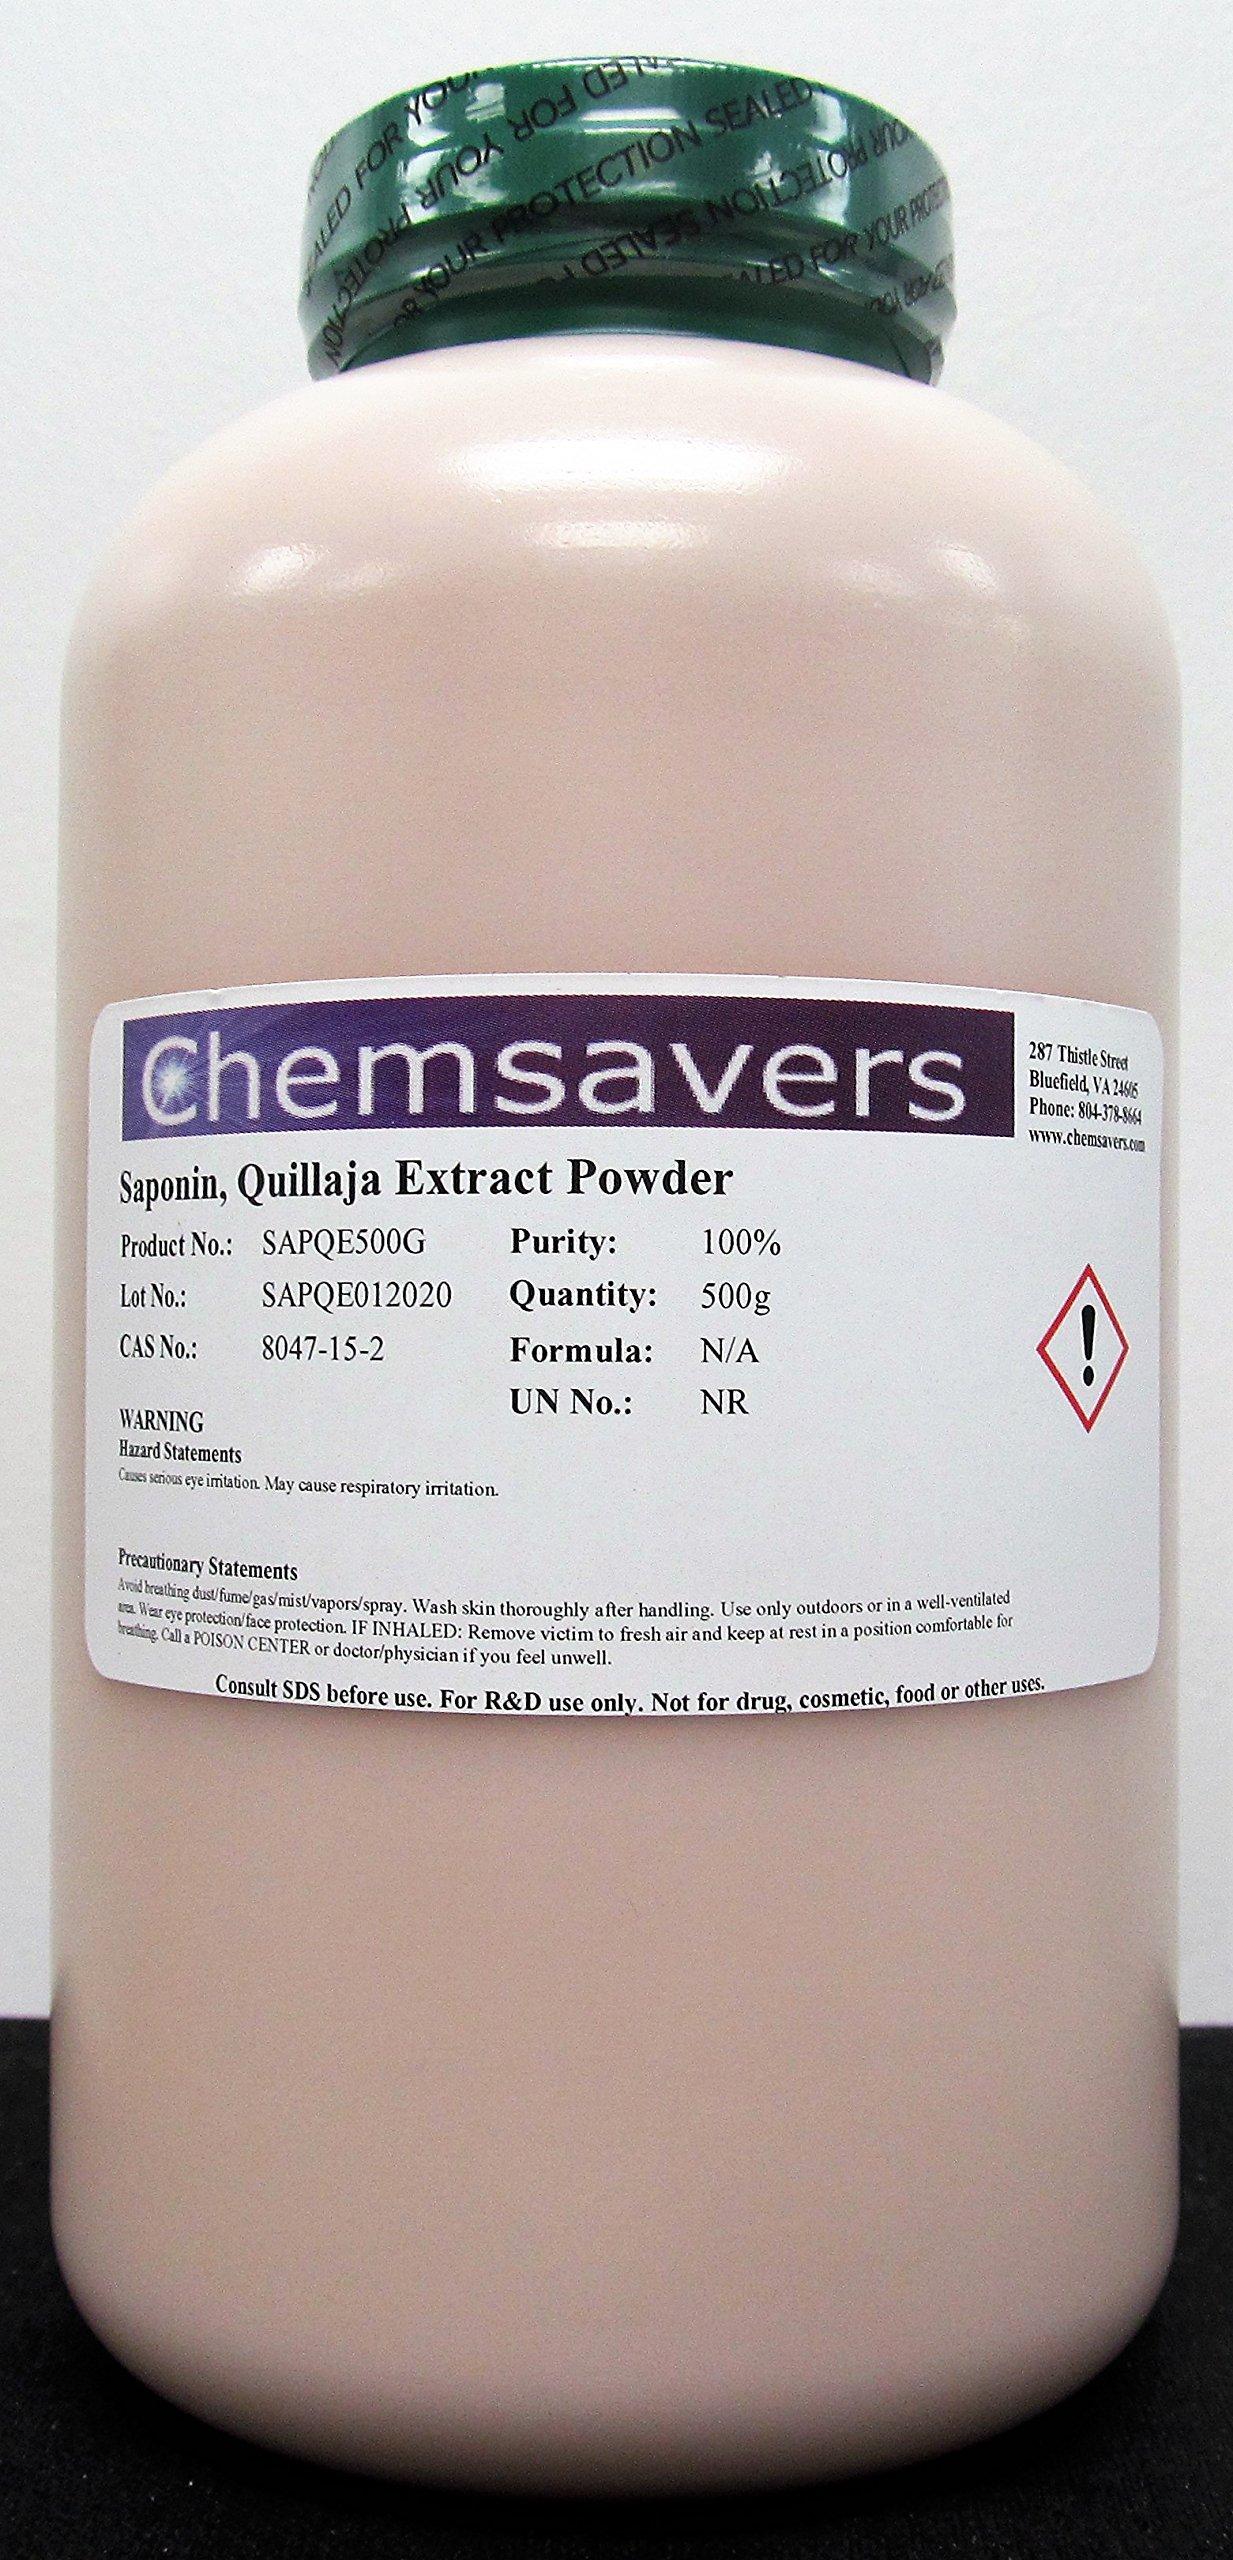 Saponin, Quillaja Extract Powder, 100%, 500g